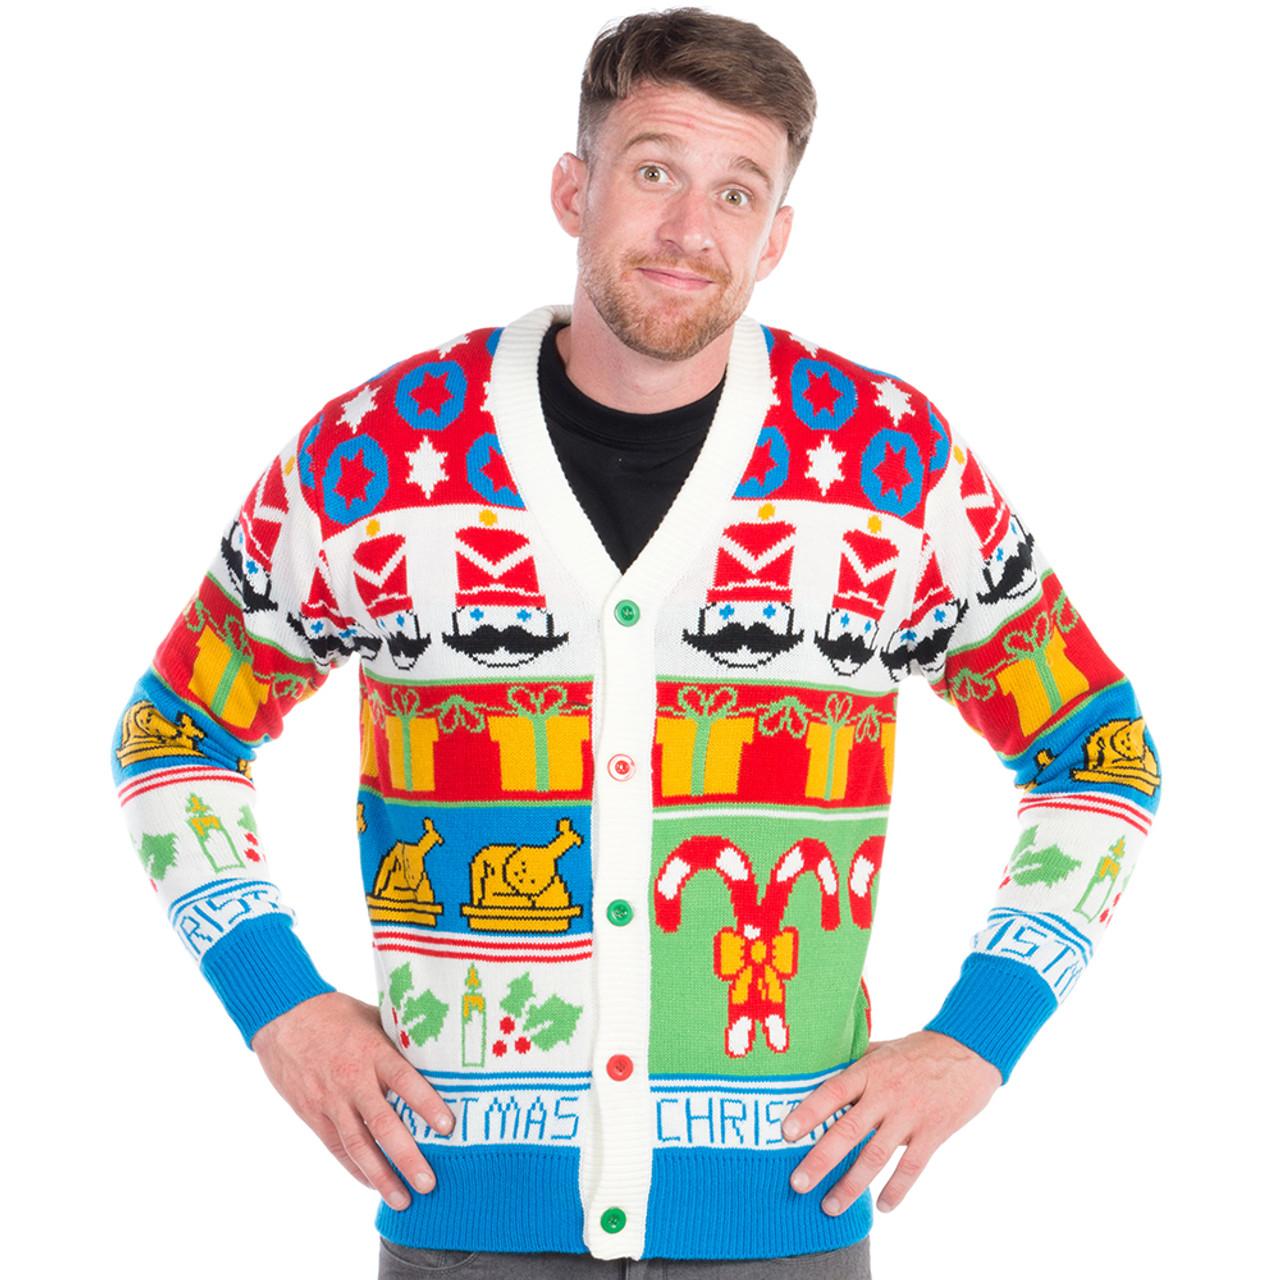 Christmas Cardigan.Cheesy Nutcracker Ugly Christmas Cardigan World S Best